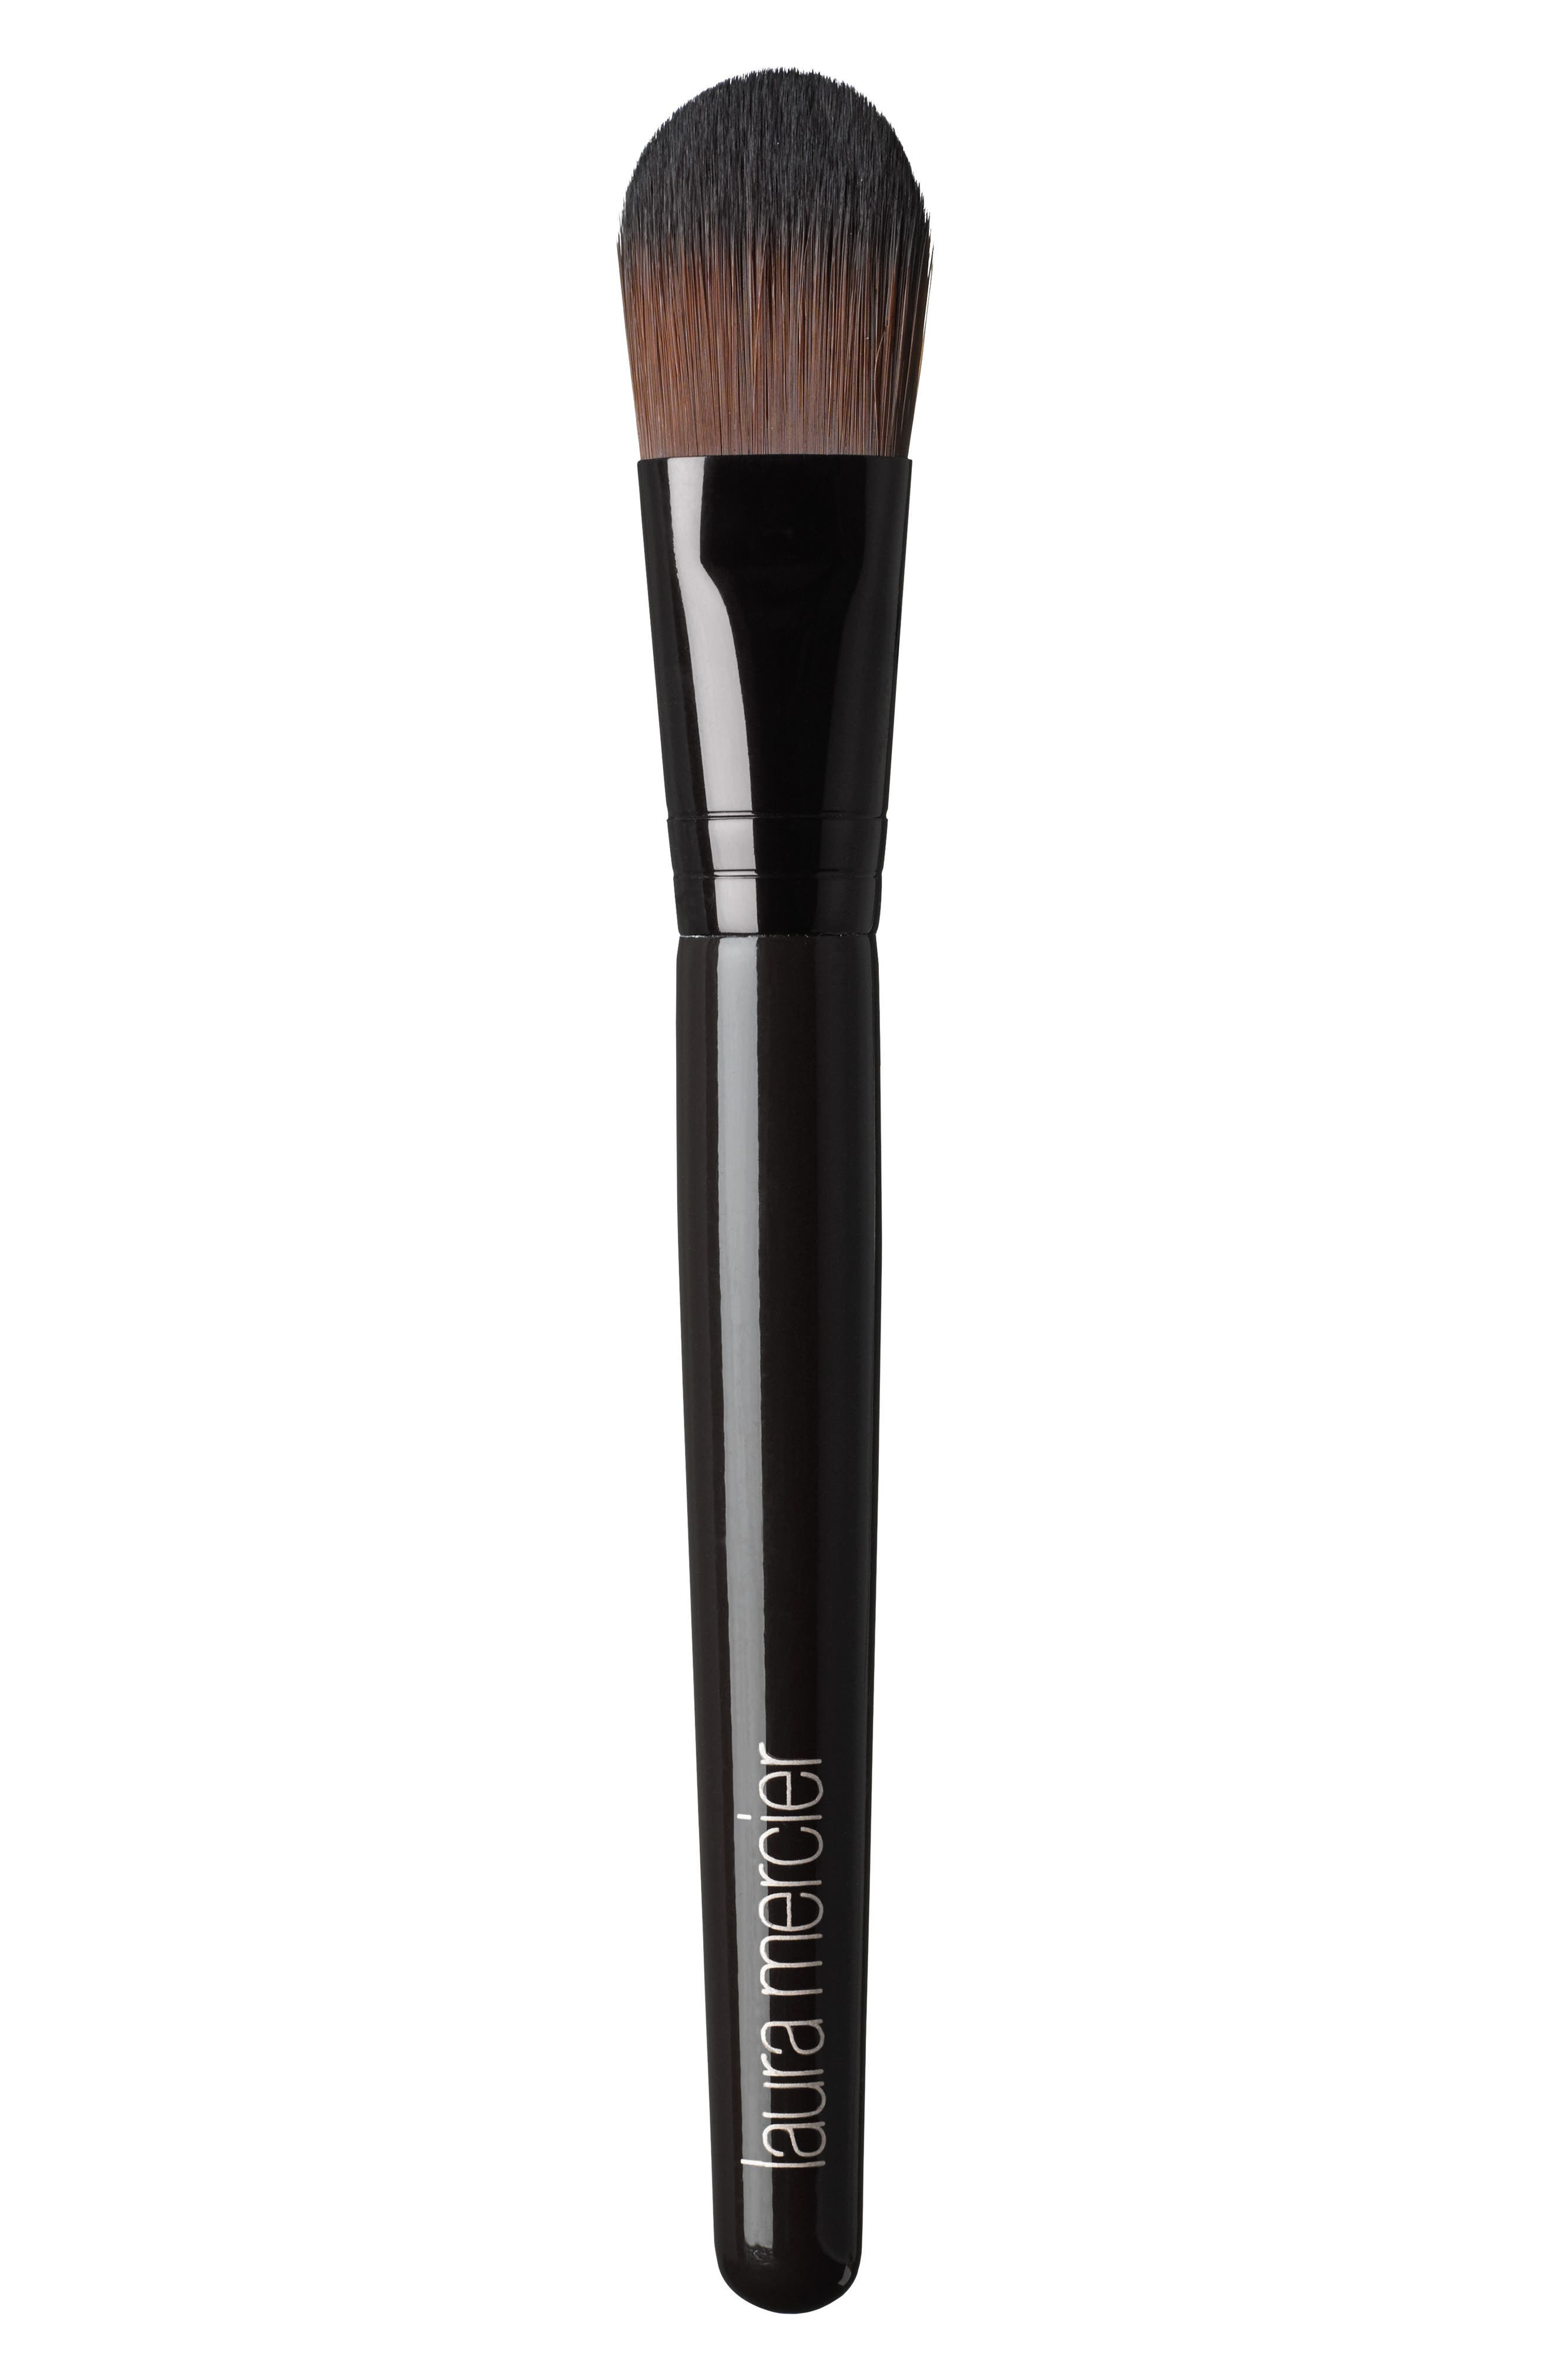 Crème Cheek Color Brush,                         Main,                         color, No Color